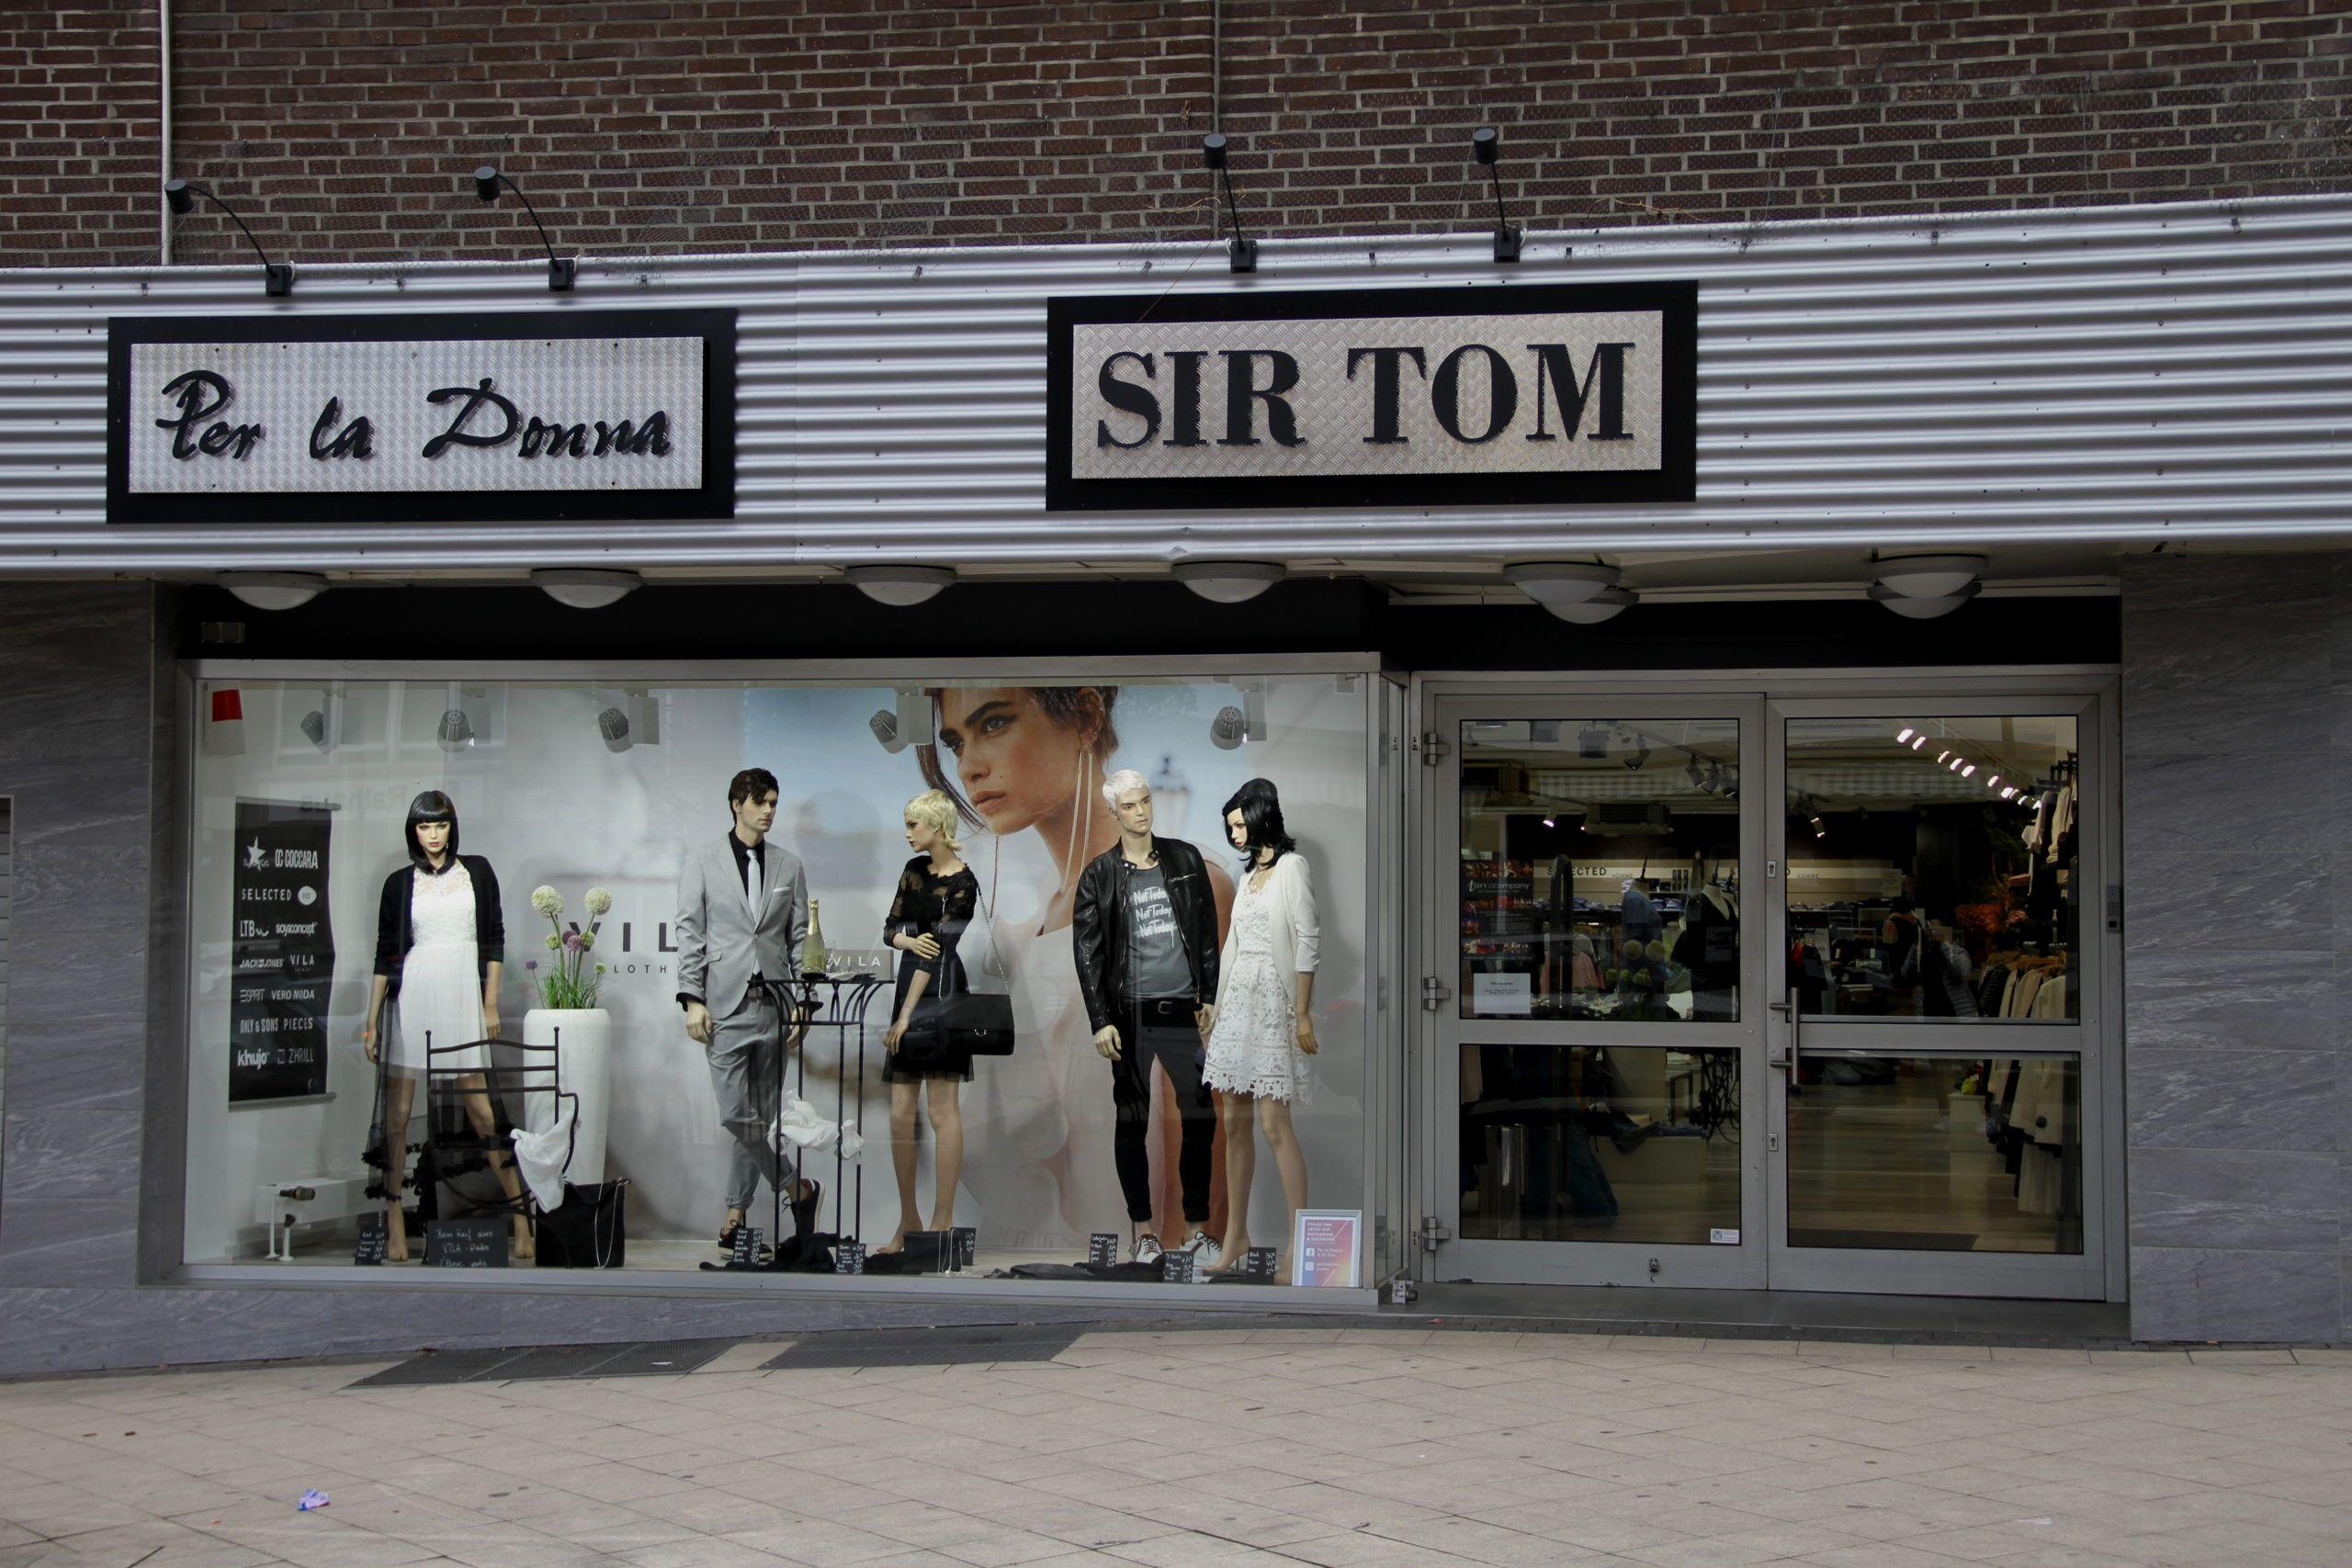 Per la Donna & Sir Tom